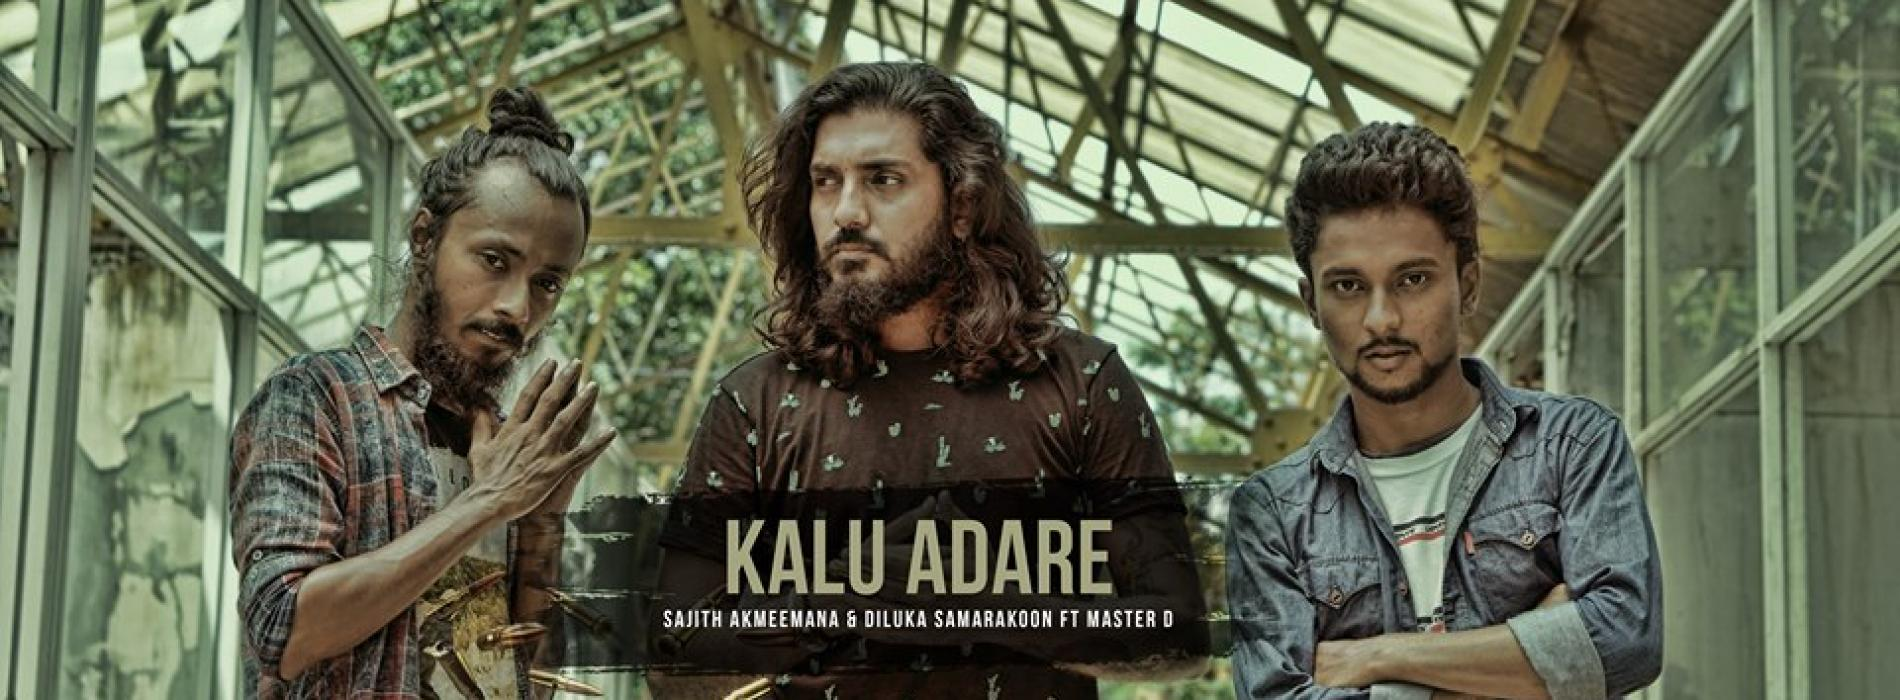 KALU ADARE | Sajith Akmeemana & Diluka Ft Master D